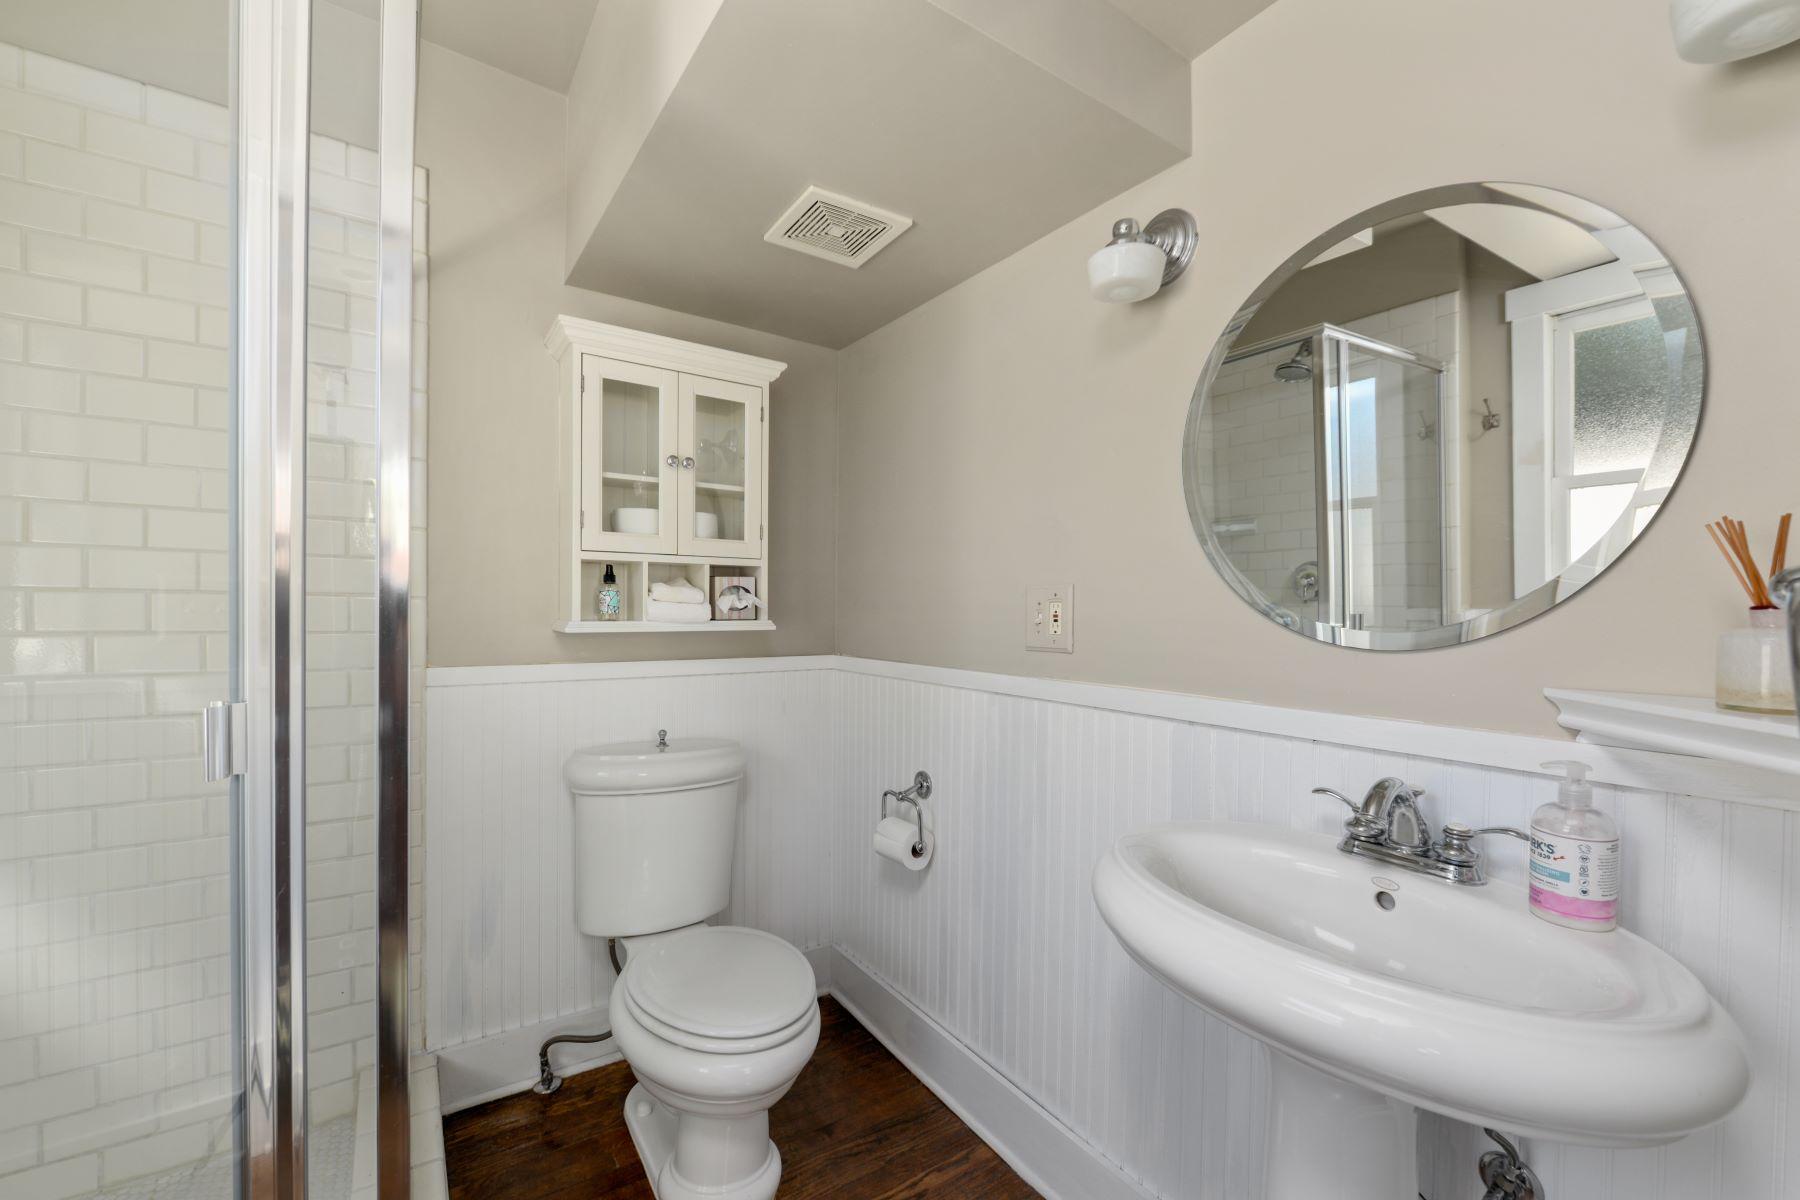 Additional photo for property listing at  Kansas City, Missouri 64111 United States